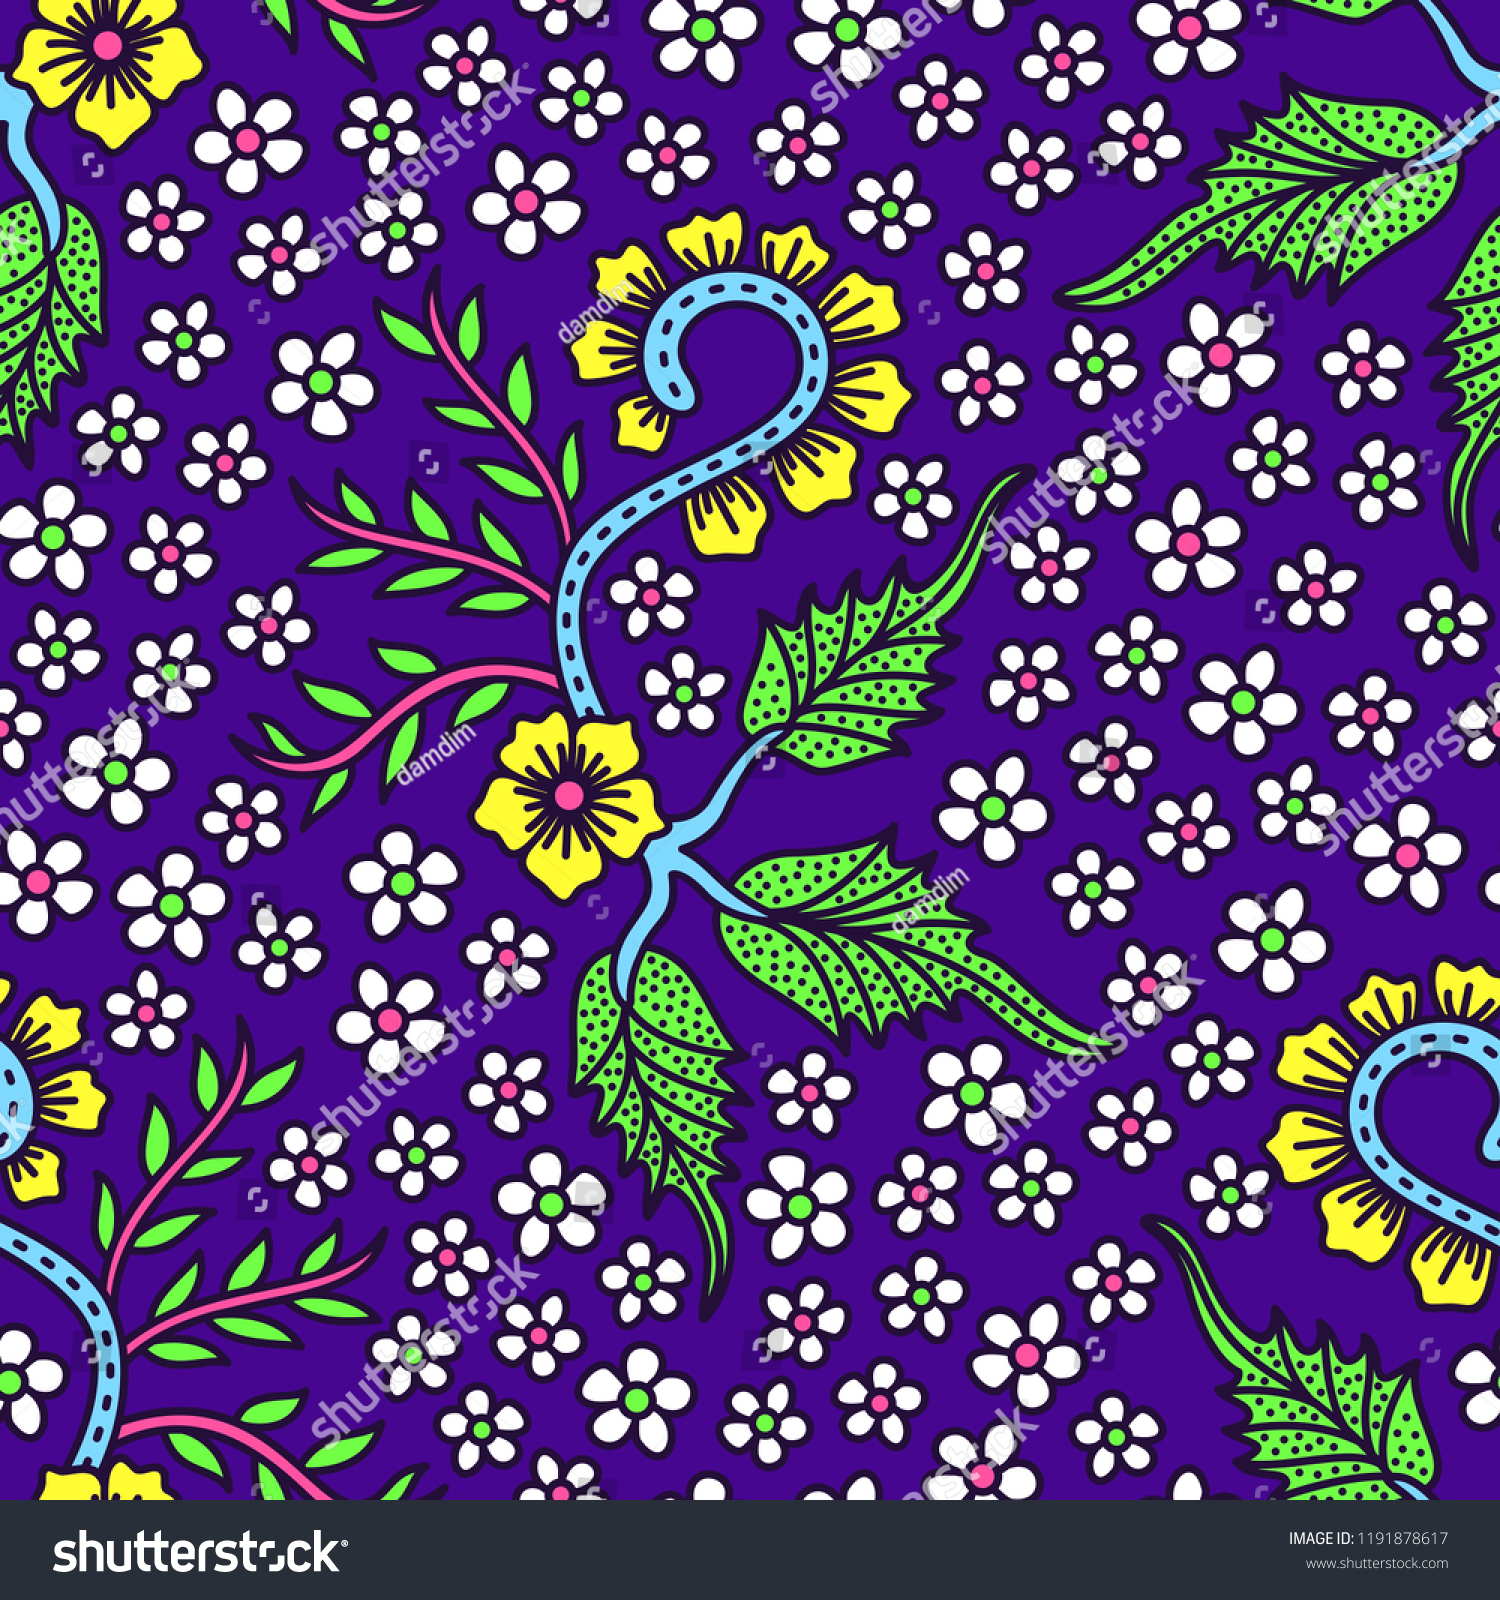 Batik Gajah Oling Banyuwangi Indonesia Stock Vector Royalty Free